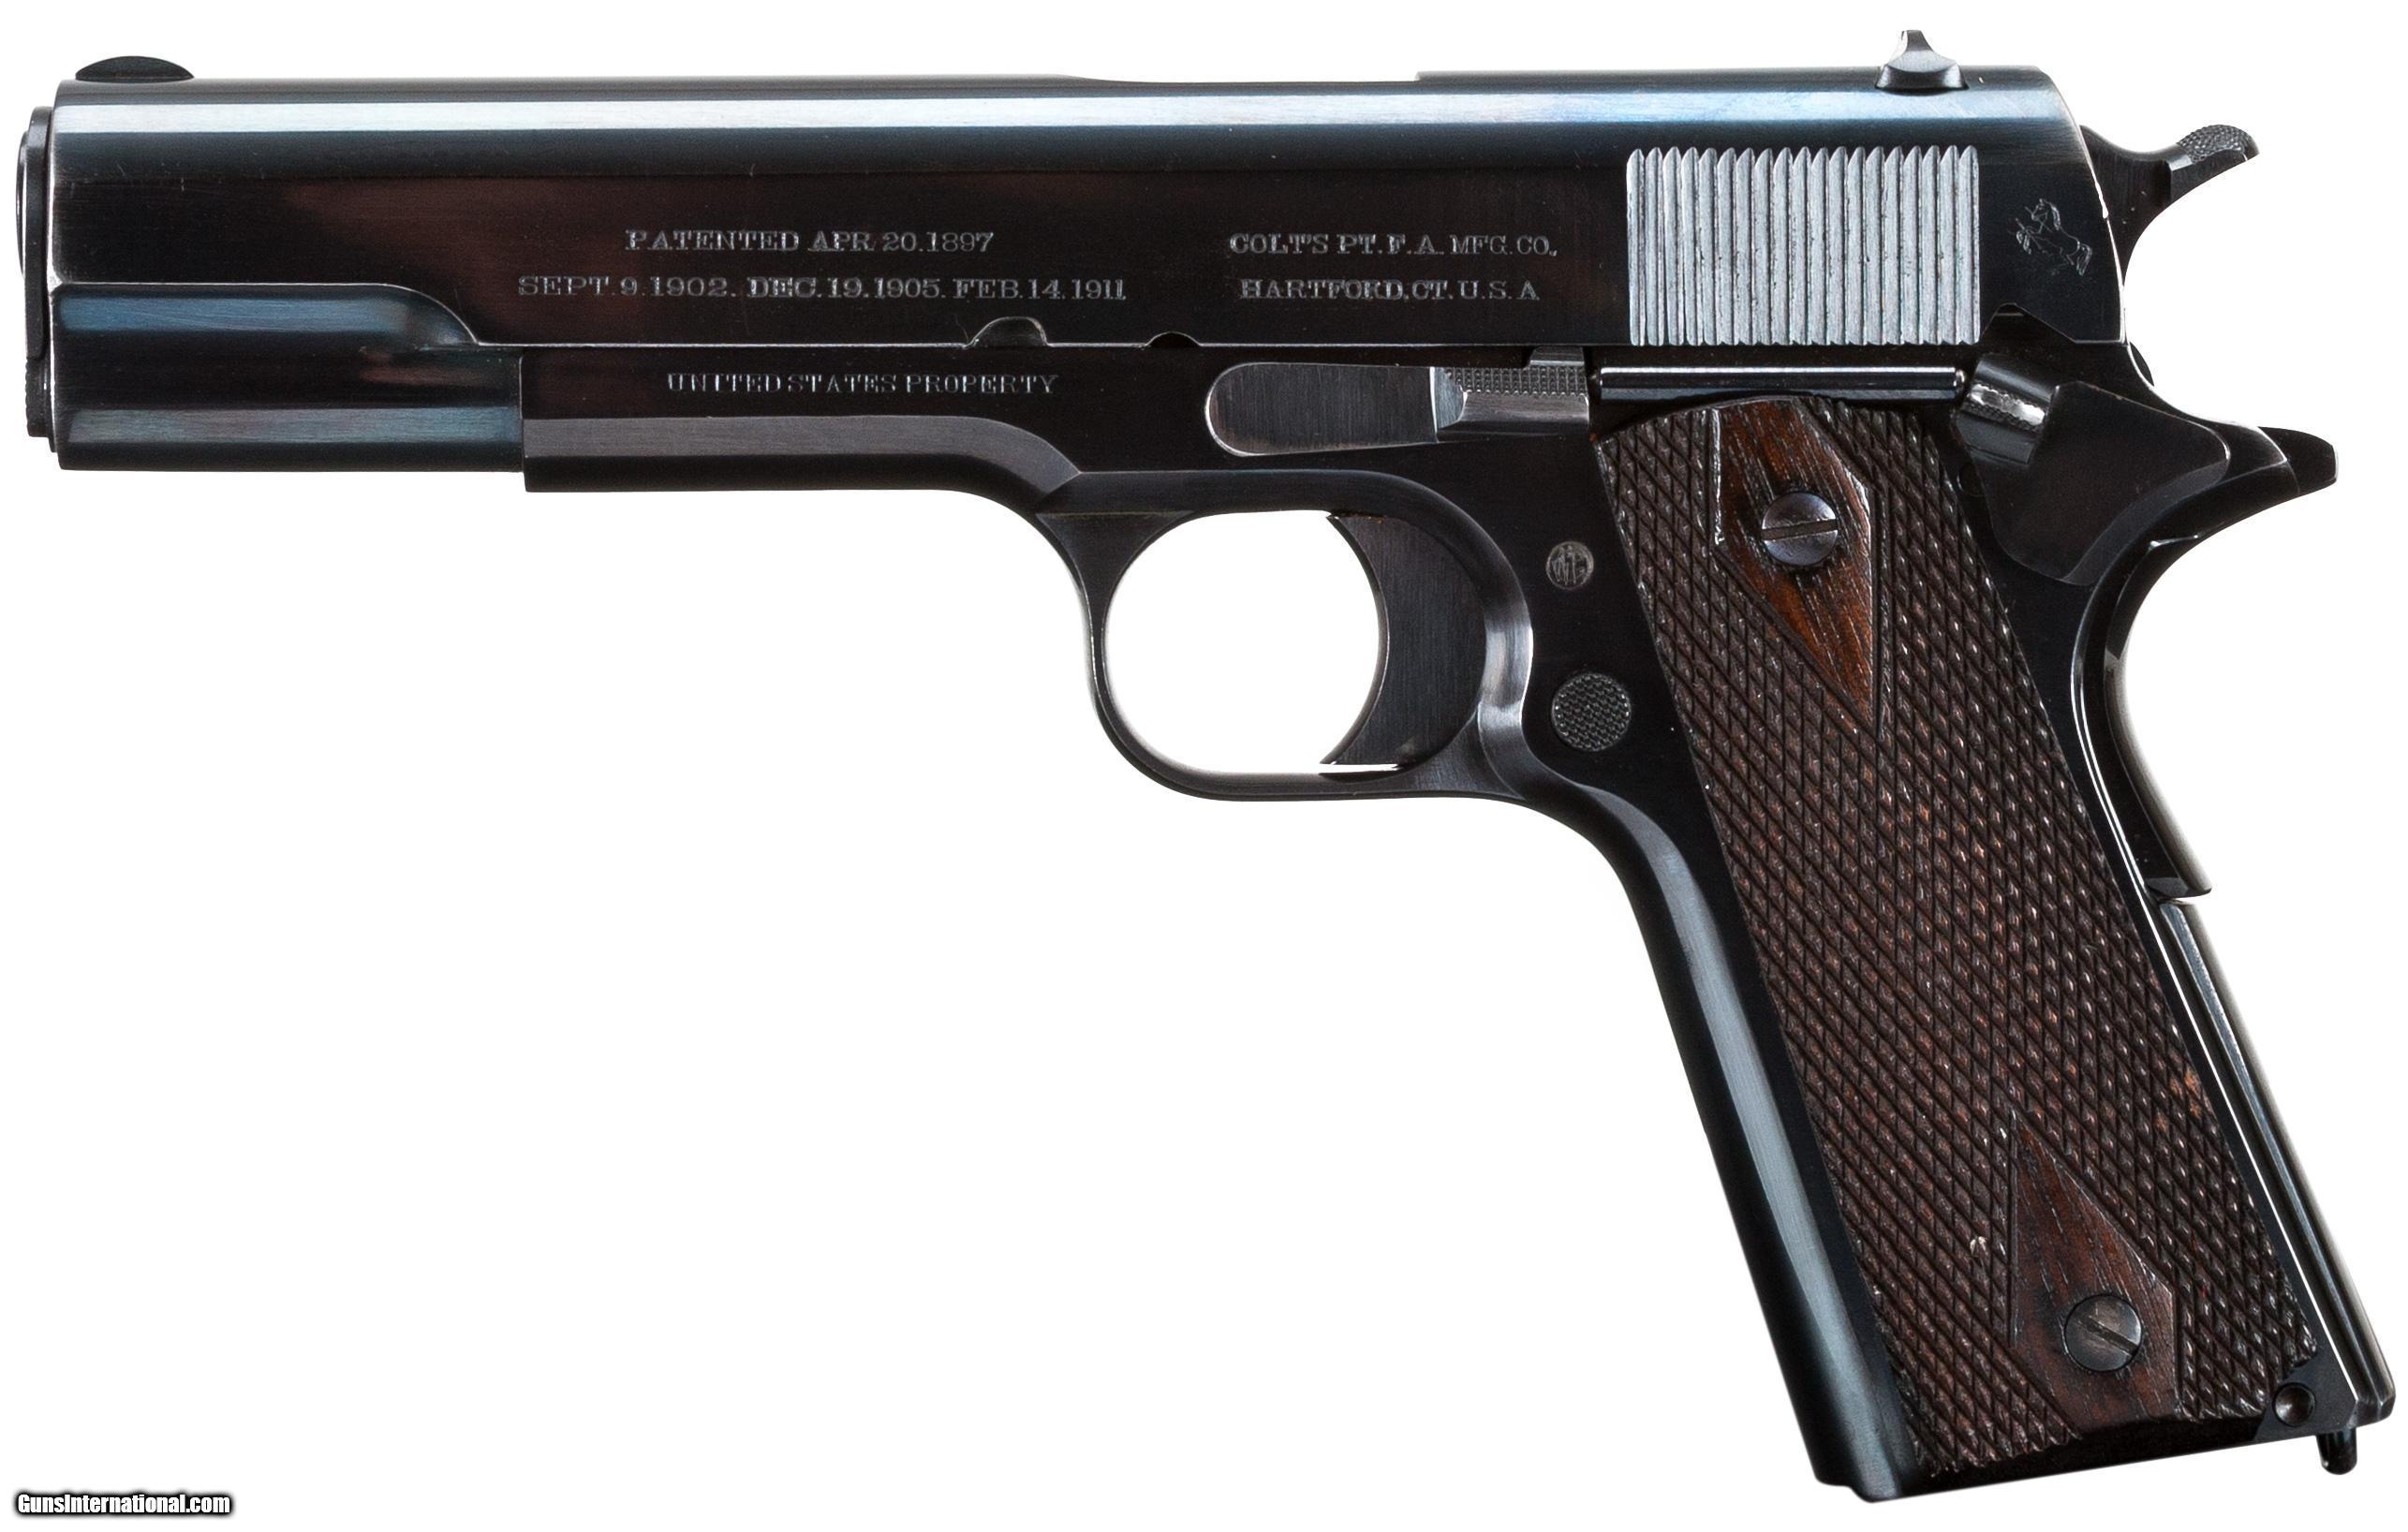 Mini Cooper Dallas >> Colt Pistols 1911 For Sale New And Used Guns For Sale | Autos Post